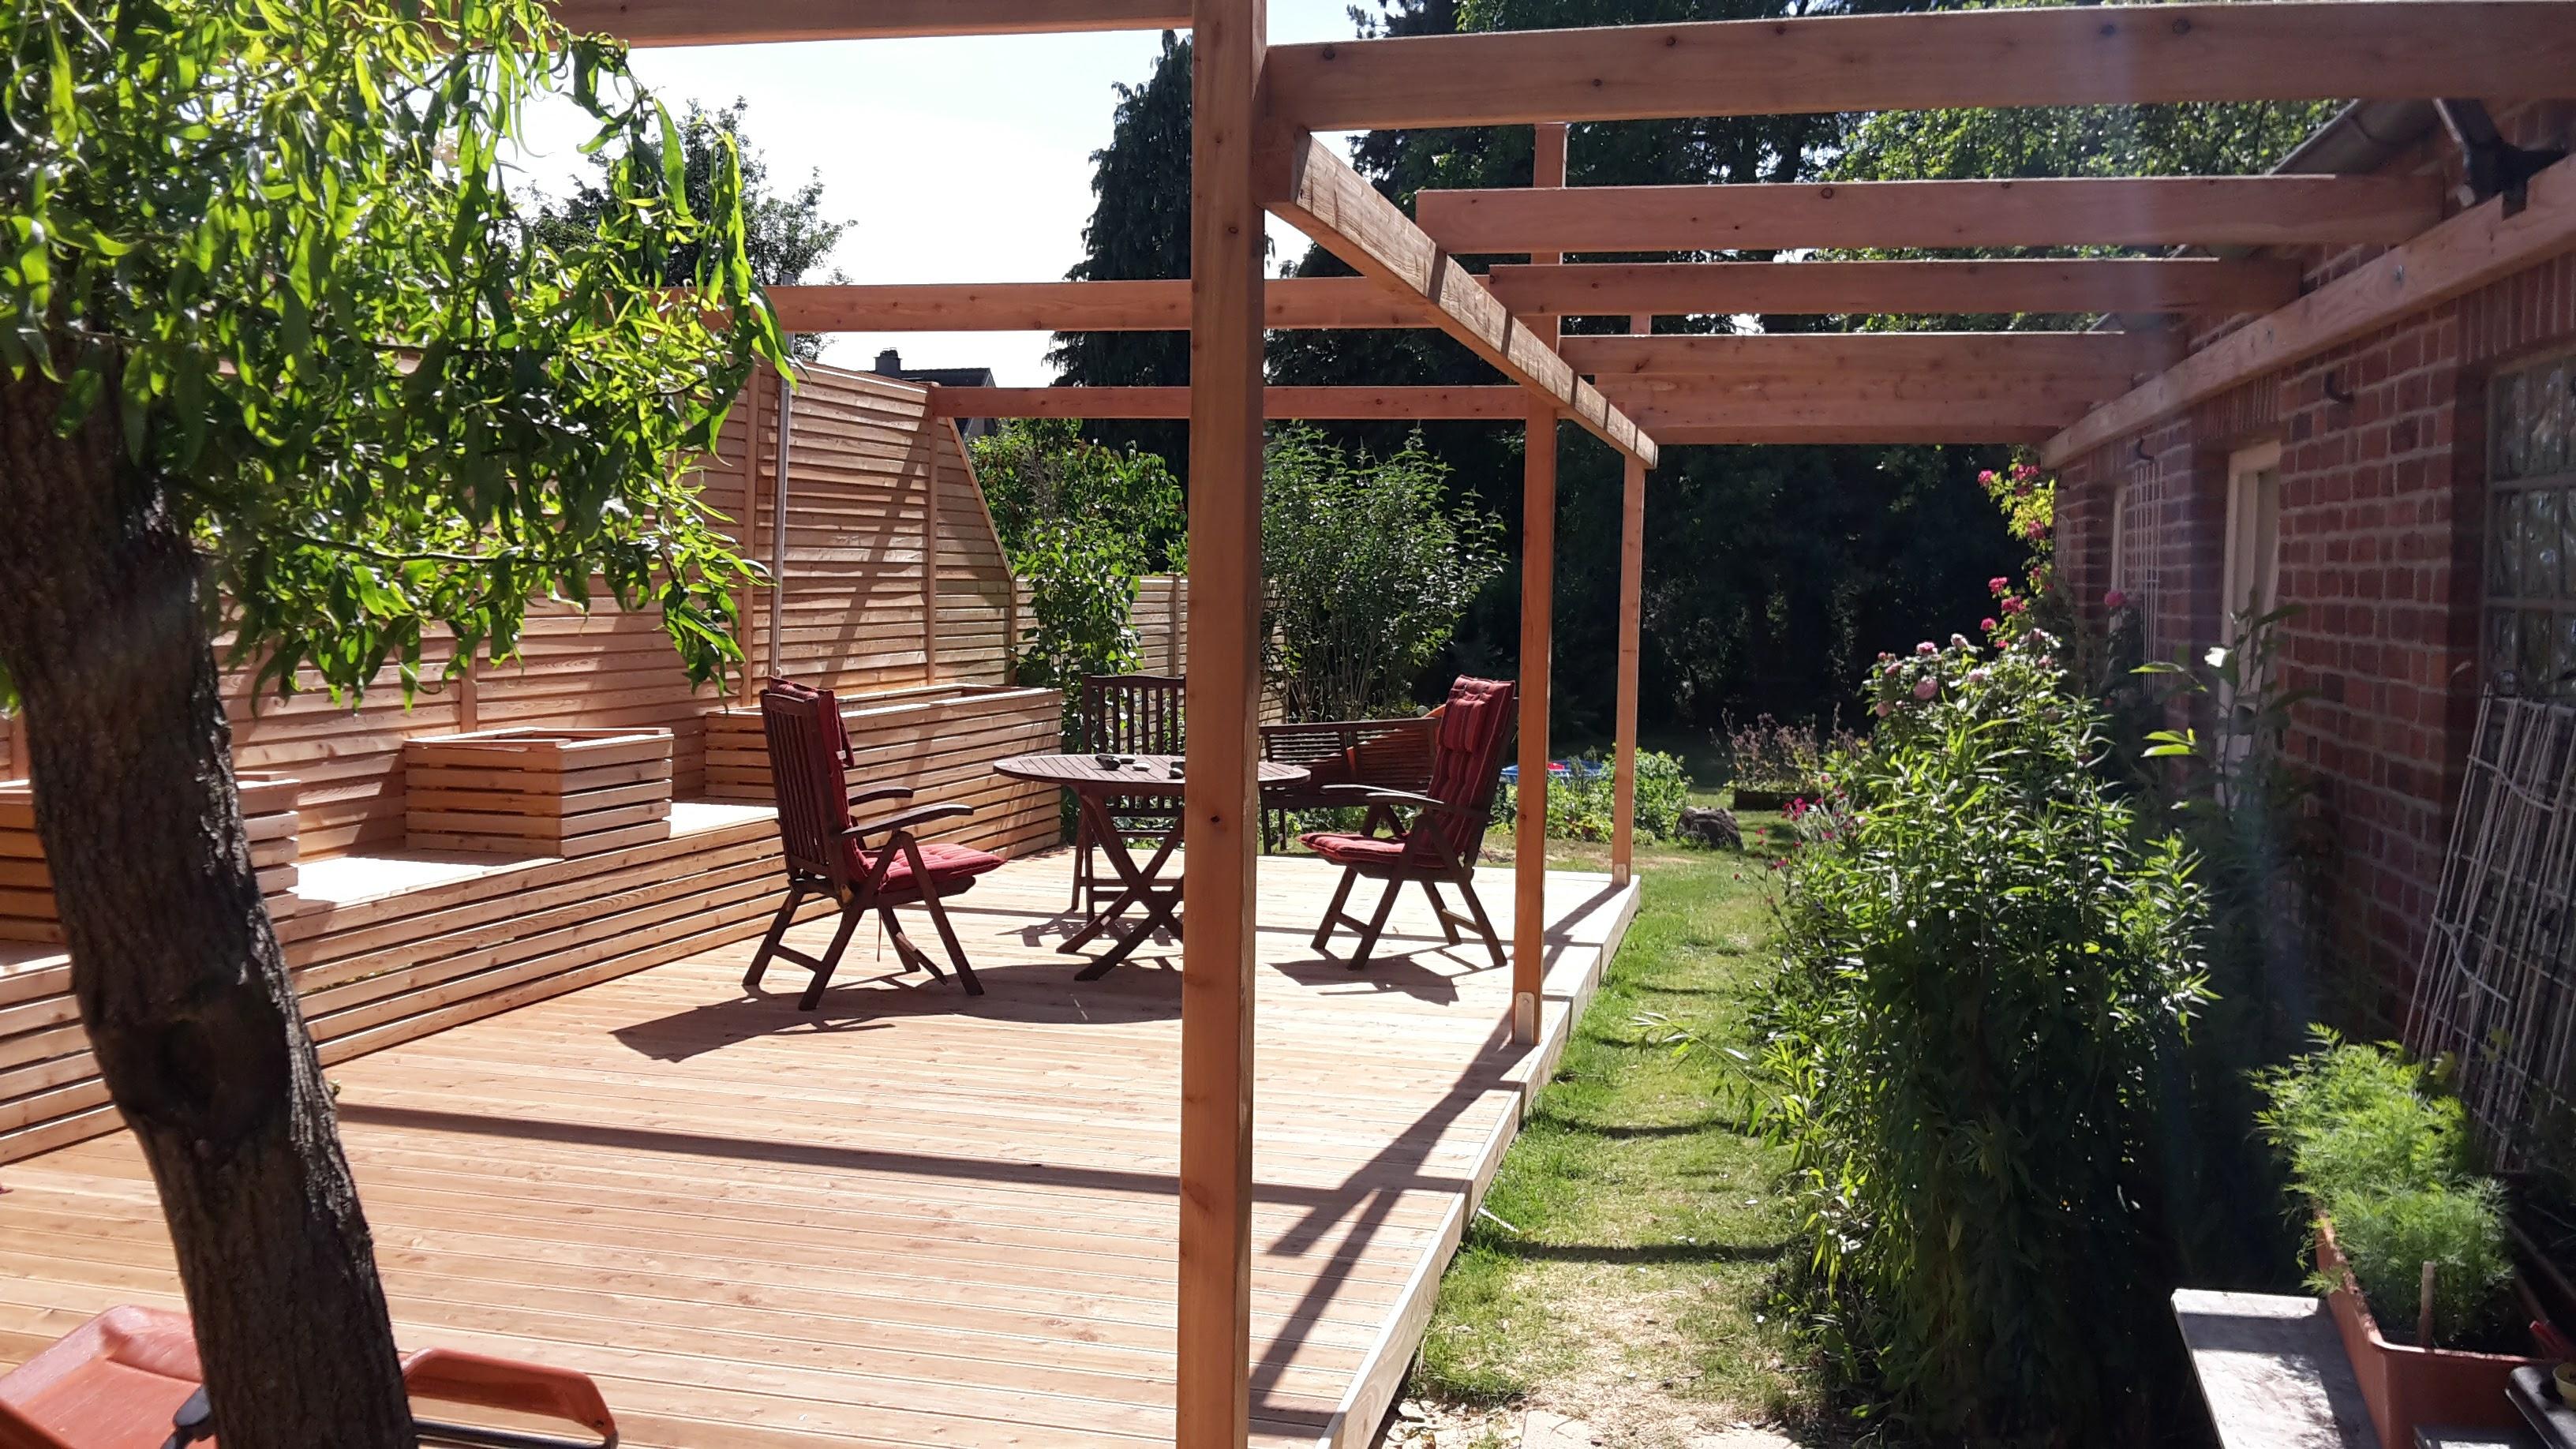 Terrasse Holz Pergola natur schön